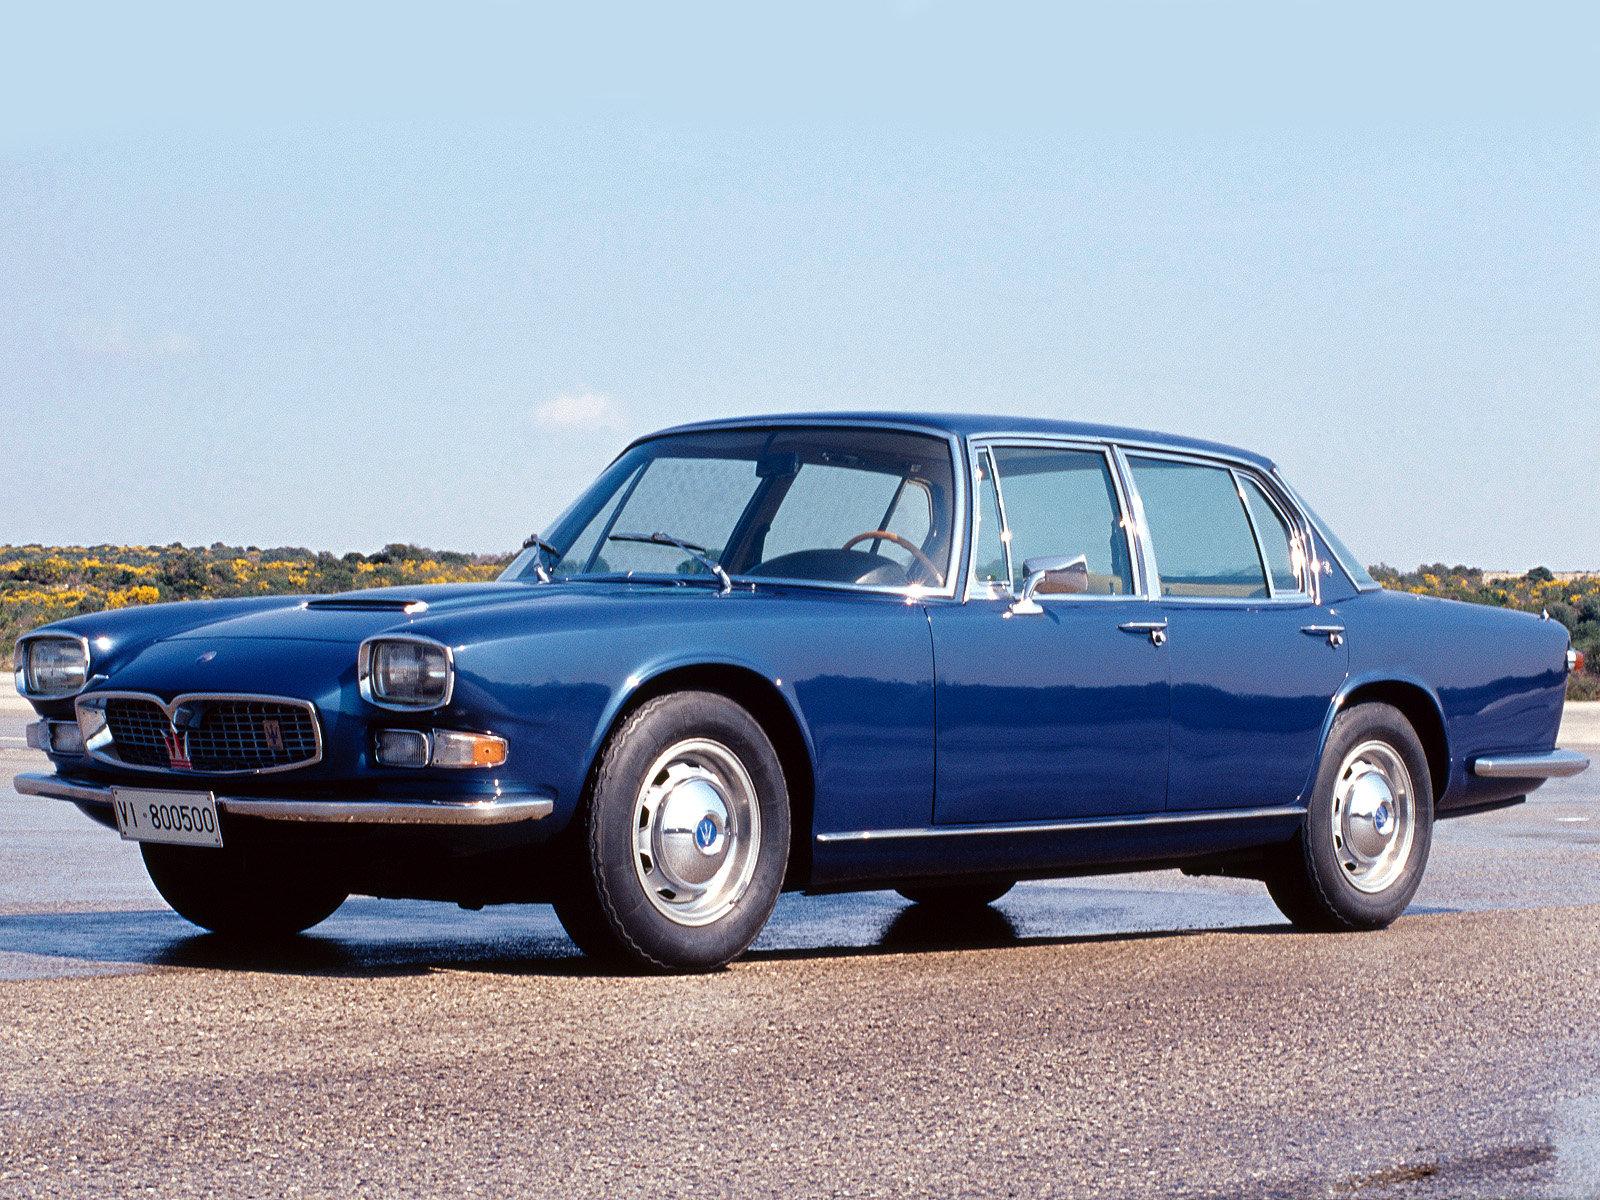 [Image: Maserati_Quattroporte_Sedan_1963.jpg]